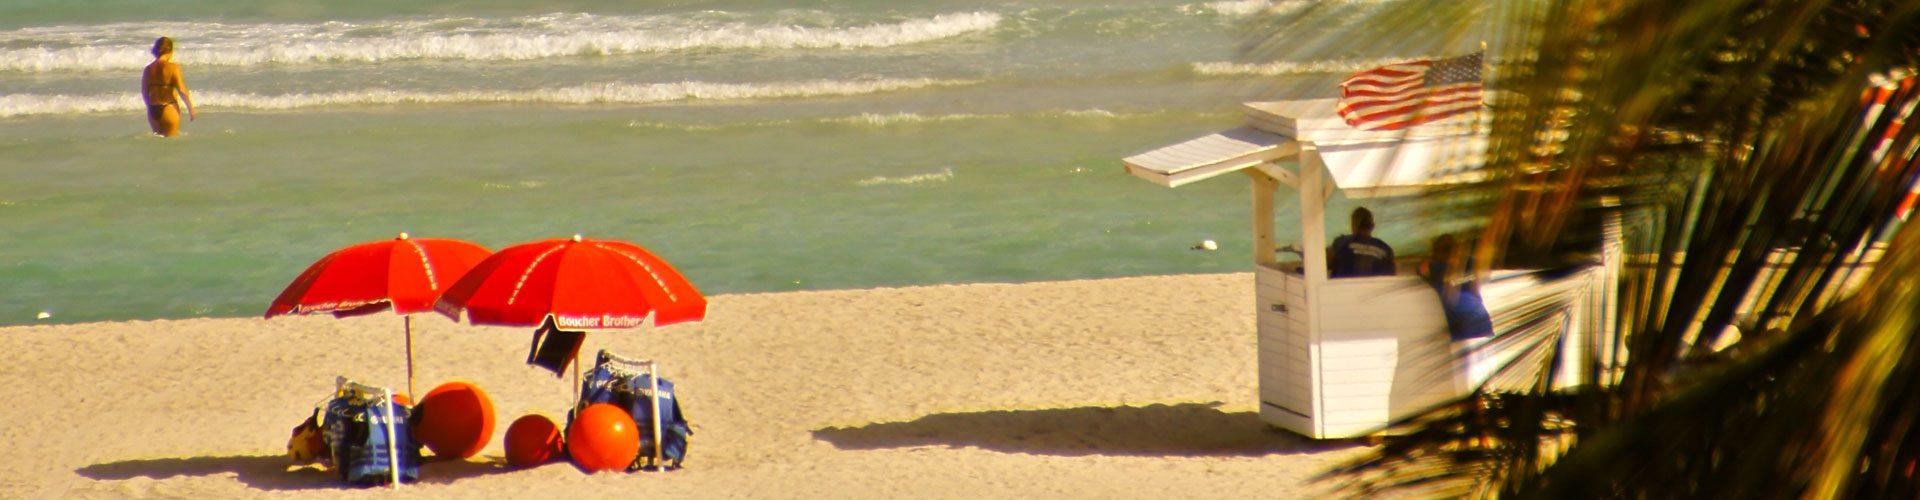 Karibikfeeling am Strand von Miami Beach, Florida